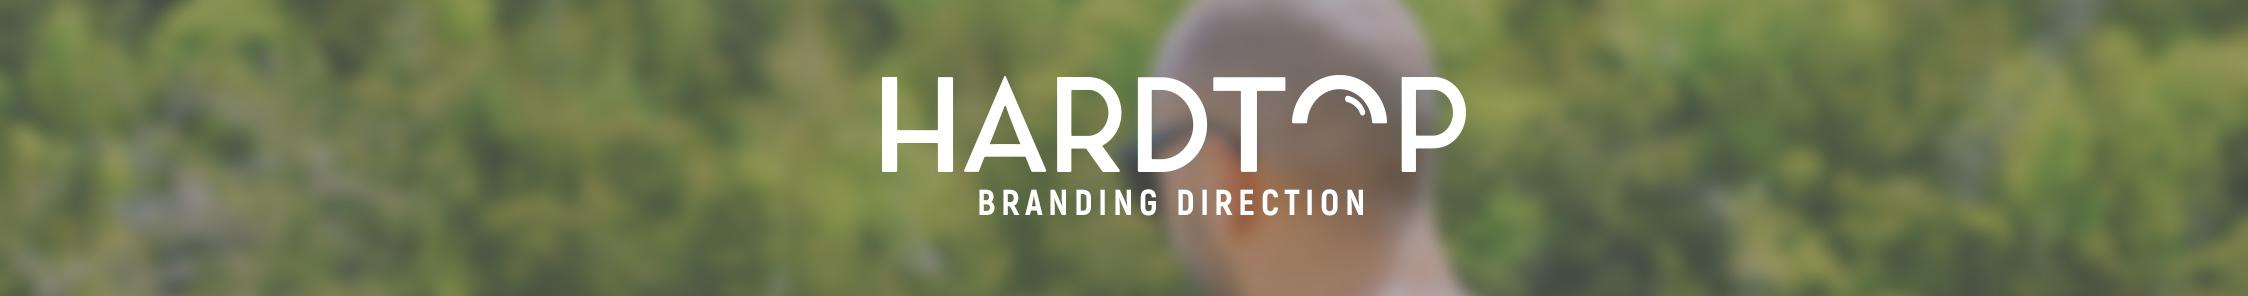 Hardtop branding direction banner.